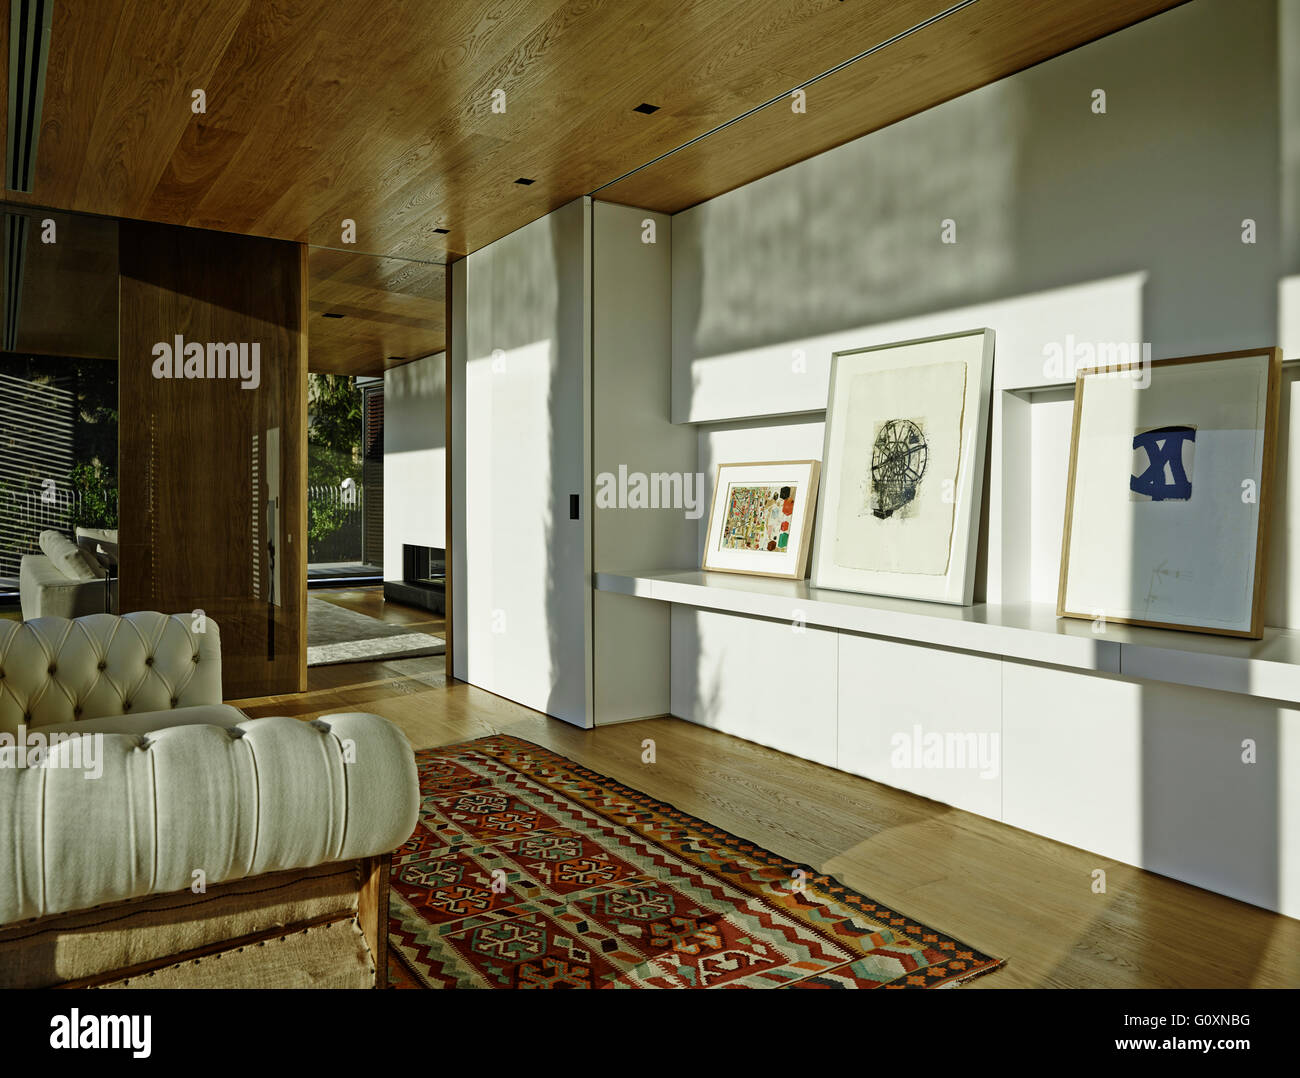 oriental rug stock photos   oriental rug stock images alamy living room bar marbella spain Living Expenses in Spain